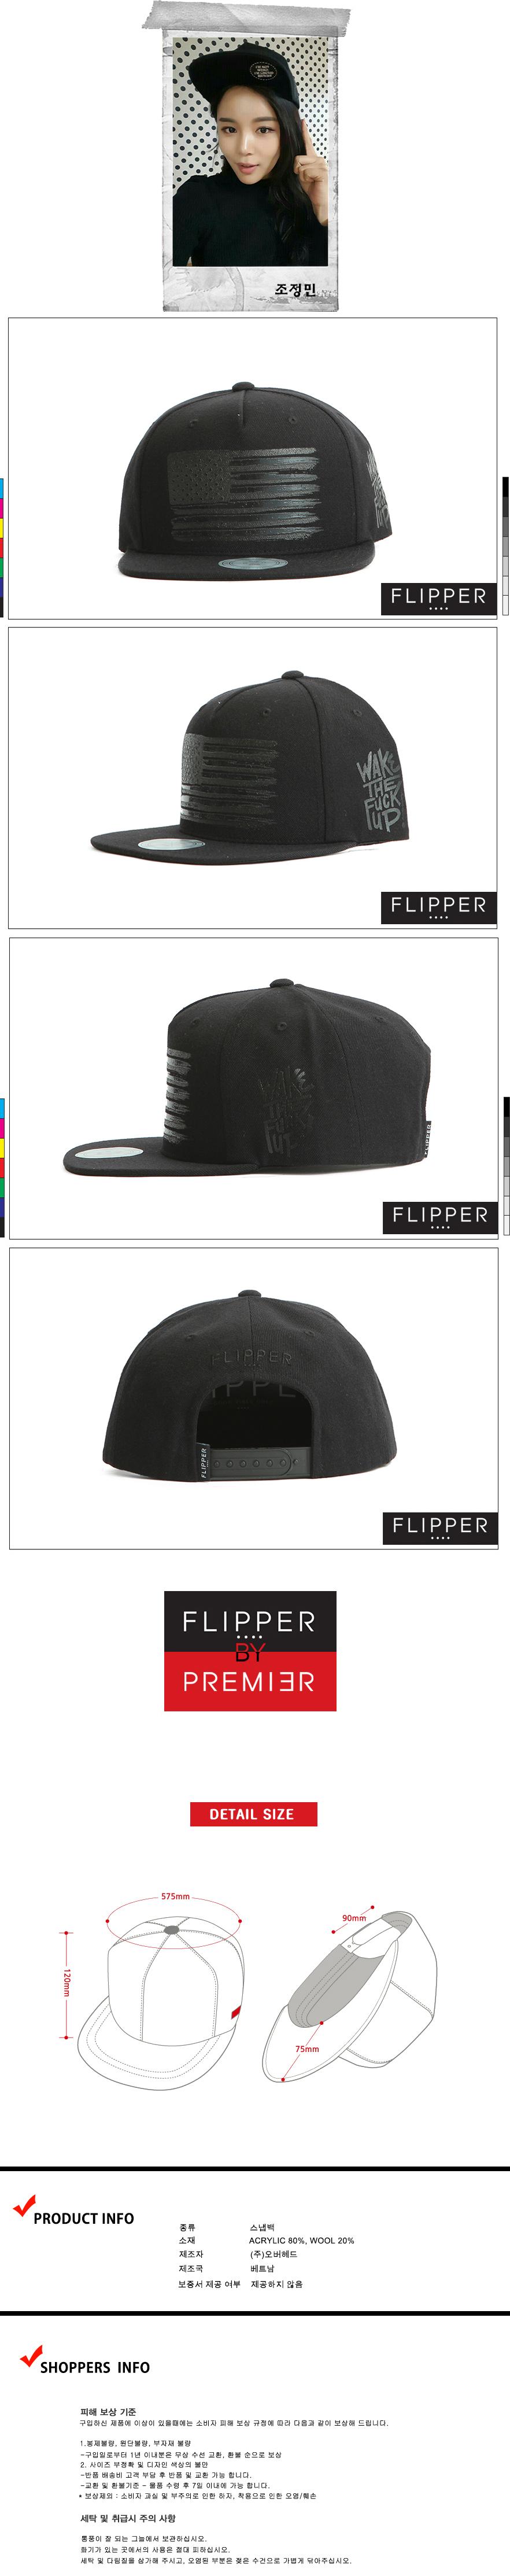 [ PREMIER ] [Premier] Flipper Snapback USA Black (FL041)